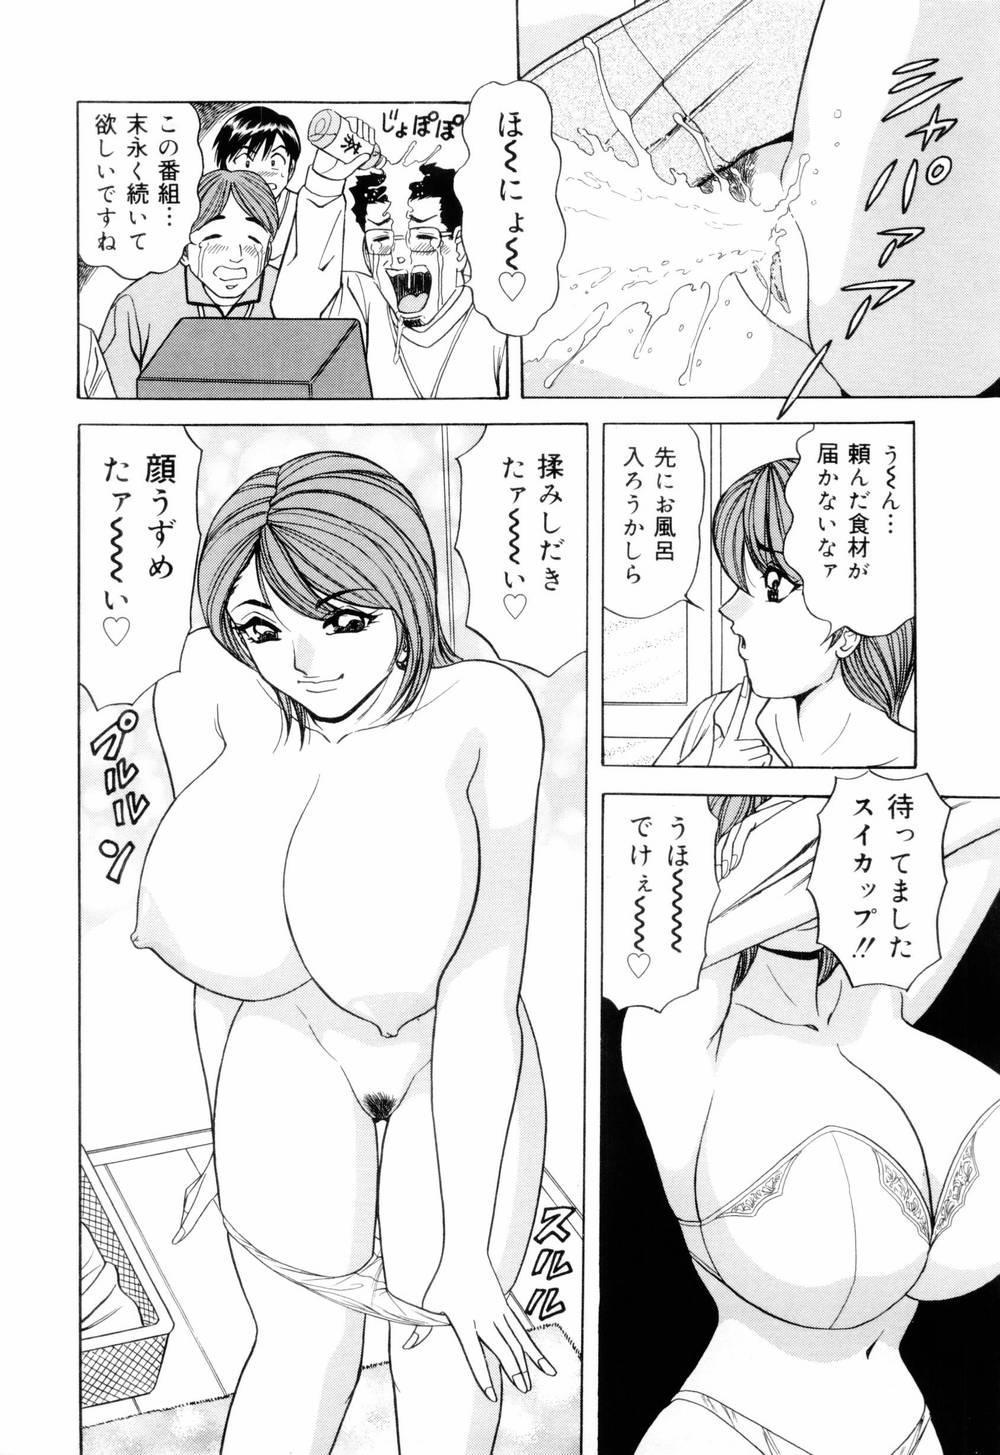 SuiCup Joshi Announcer Jikkyo Chukei Rape 15